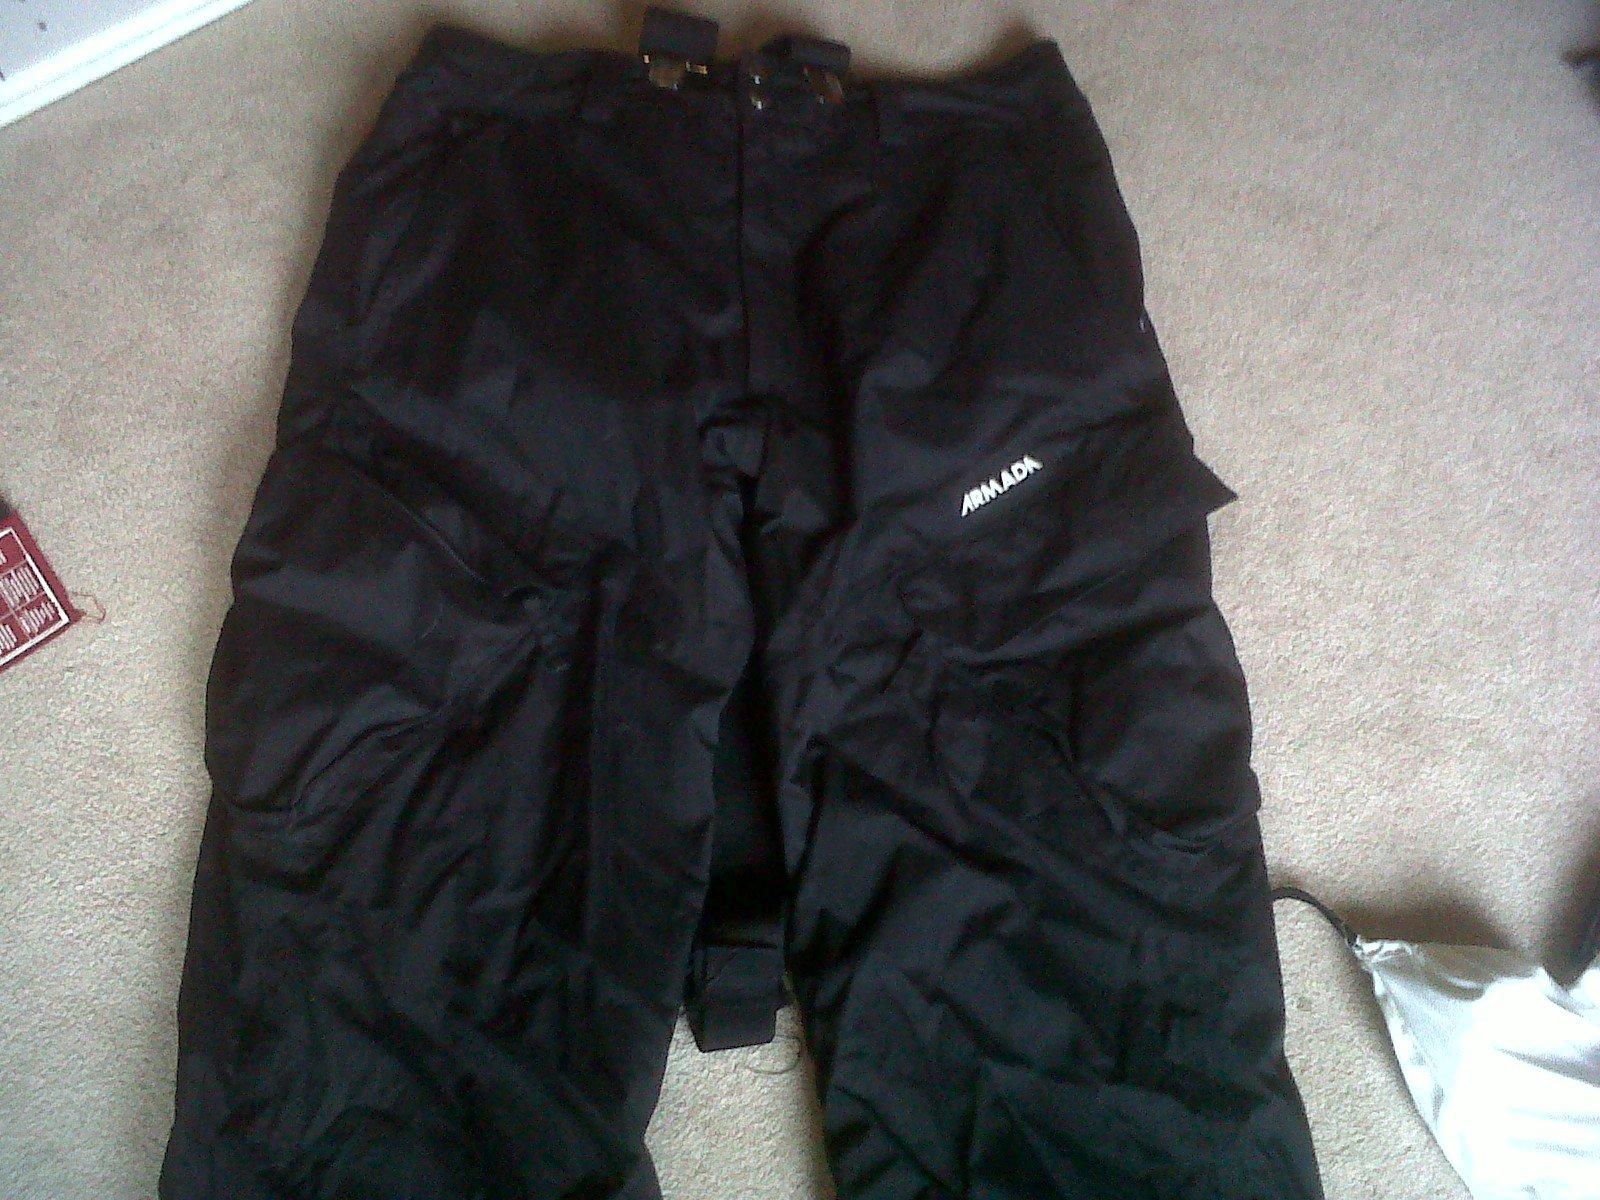 Armada pants for sale, check thread